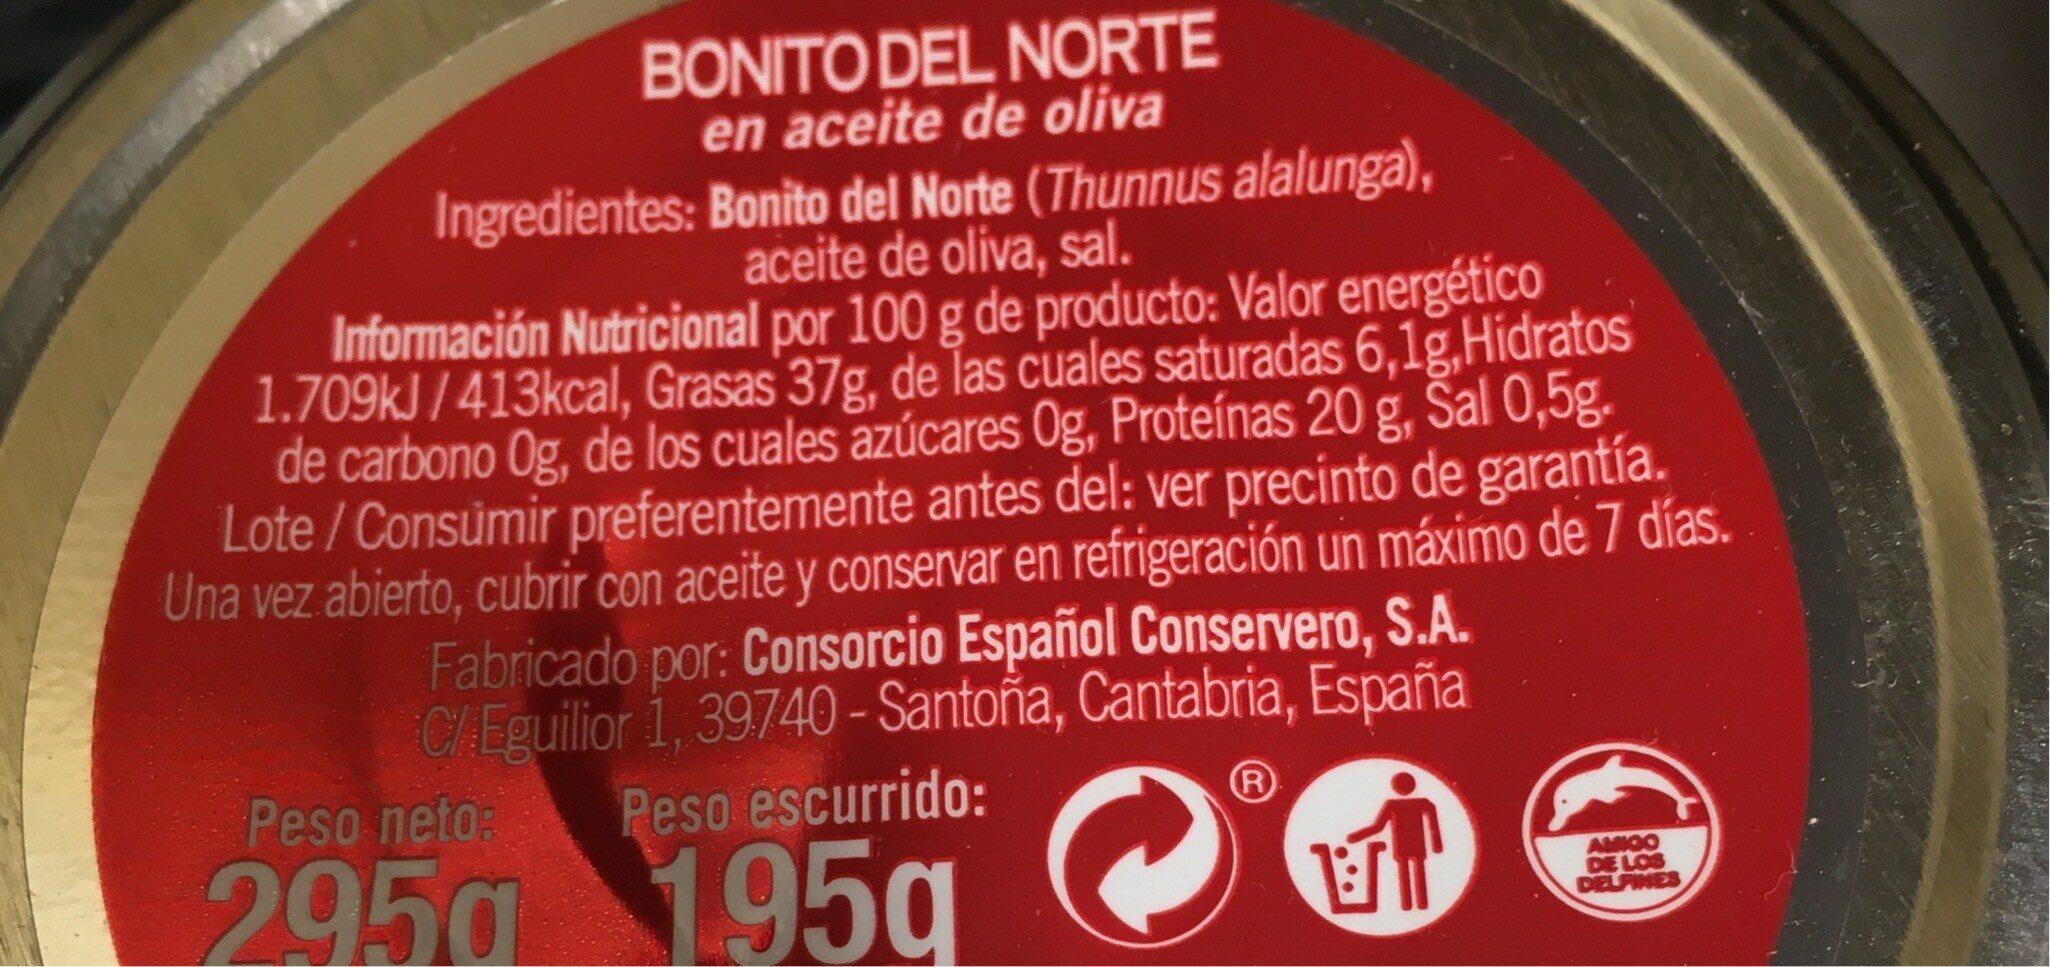 Bonito del norte - Informations nutritionnelles - fr